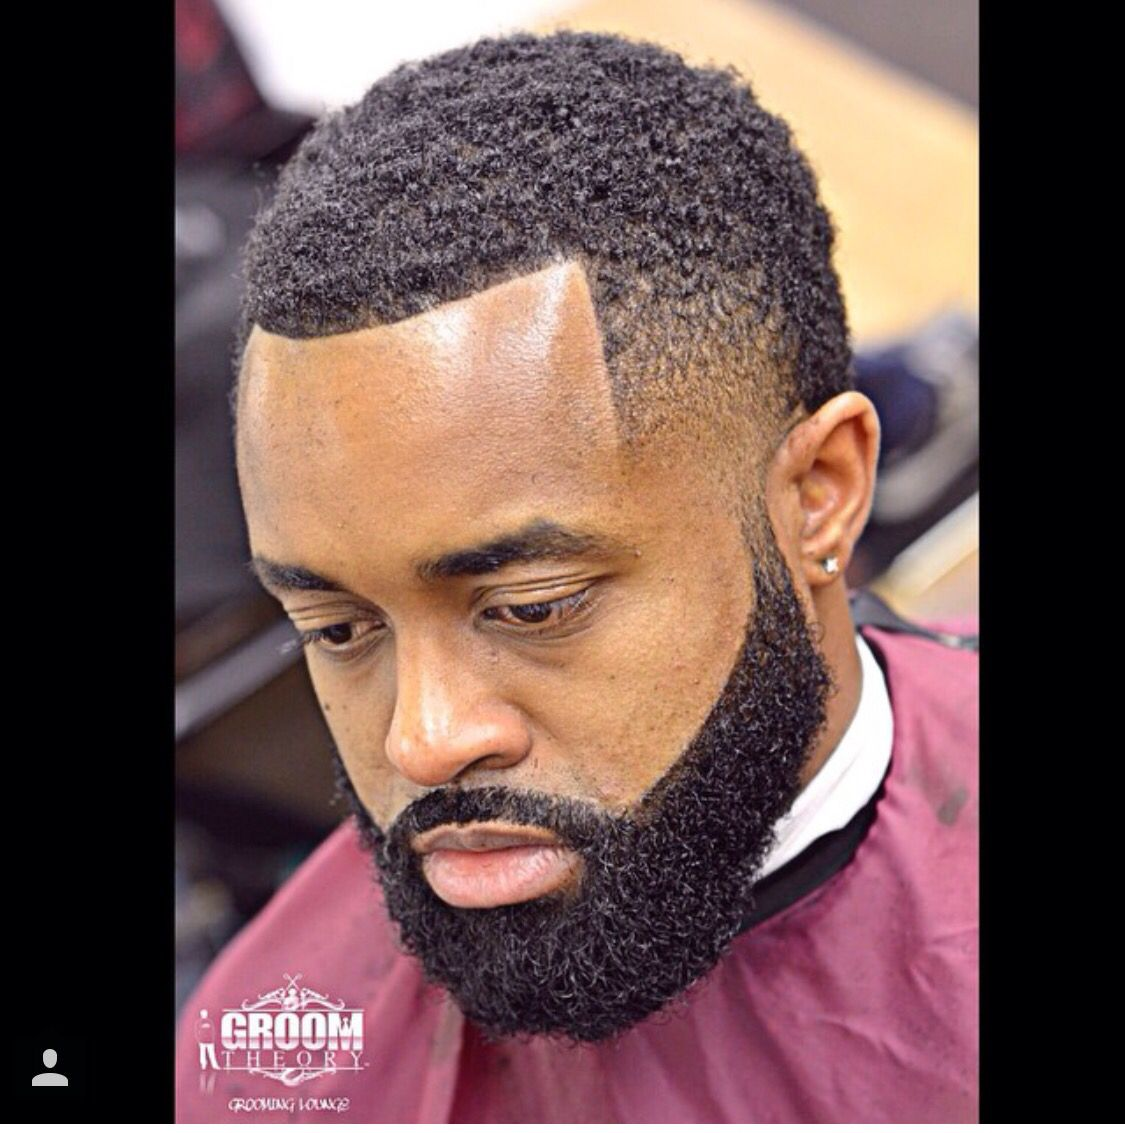 Big forehead haircut men sunni beard hebrew beard zaqan philly beard  nice cuts